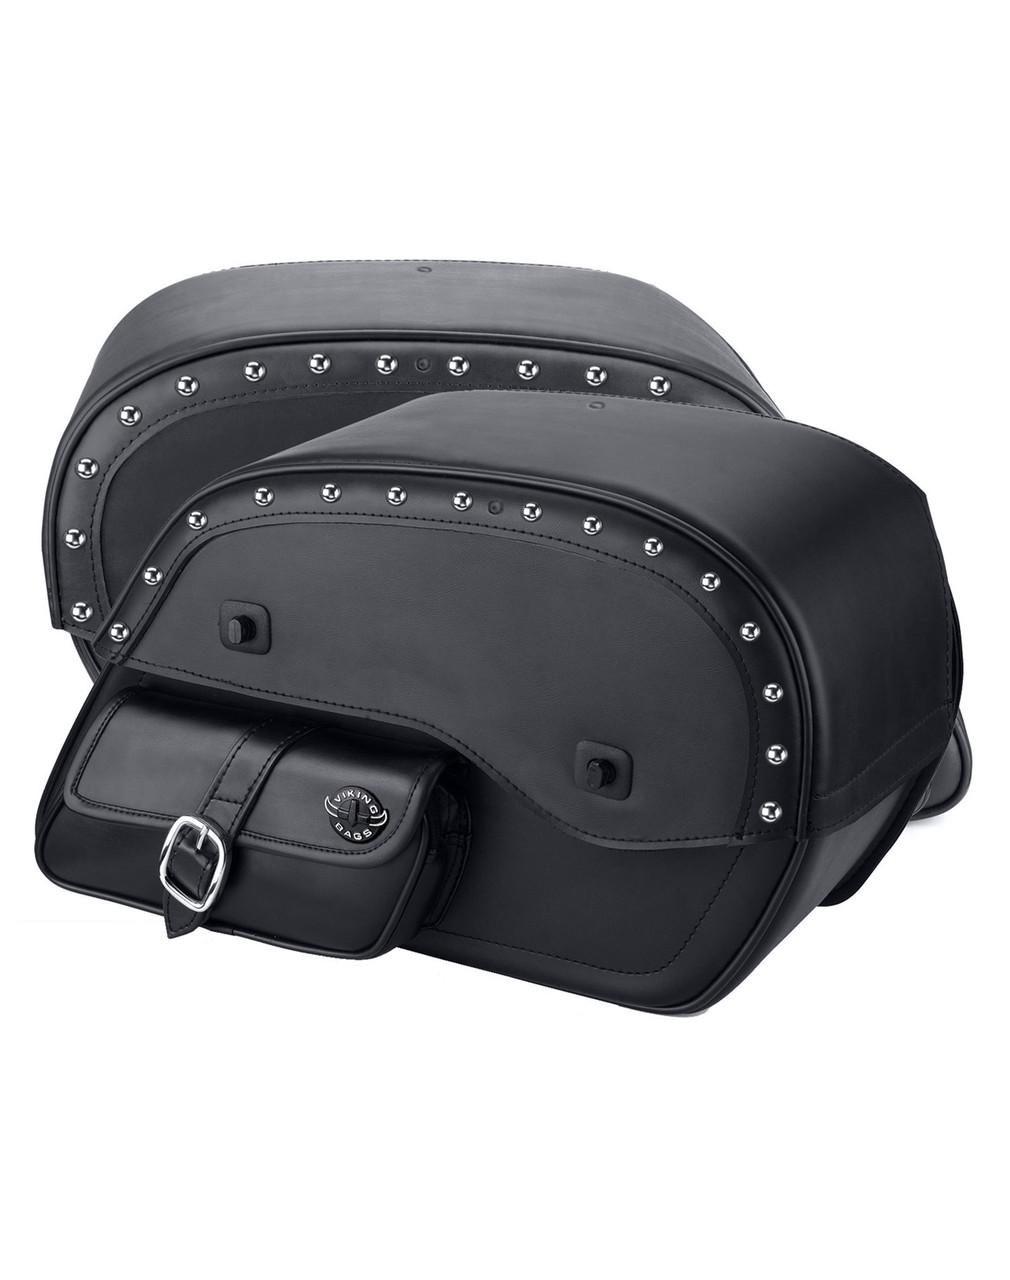 Viking SS Side Pocket Studded Large Motorcycle Saddlebags For Harley Softail Cross Bones FLSTSB both bags view